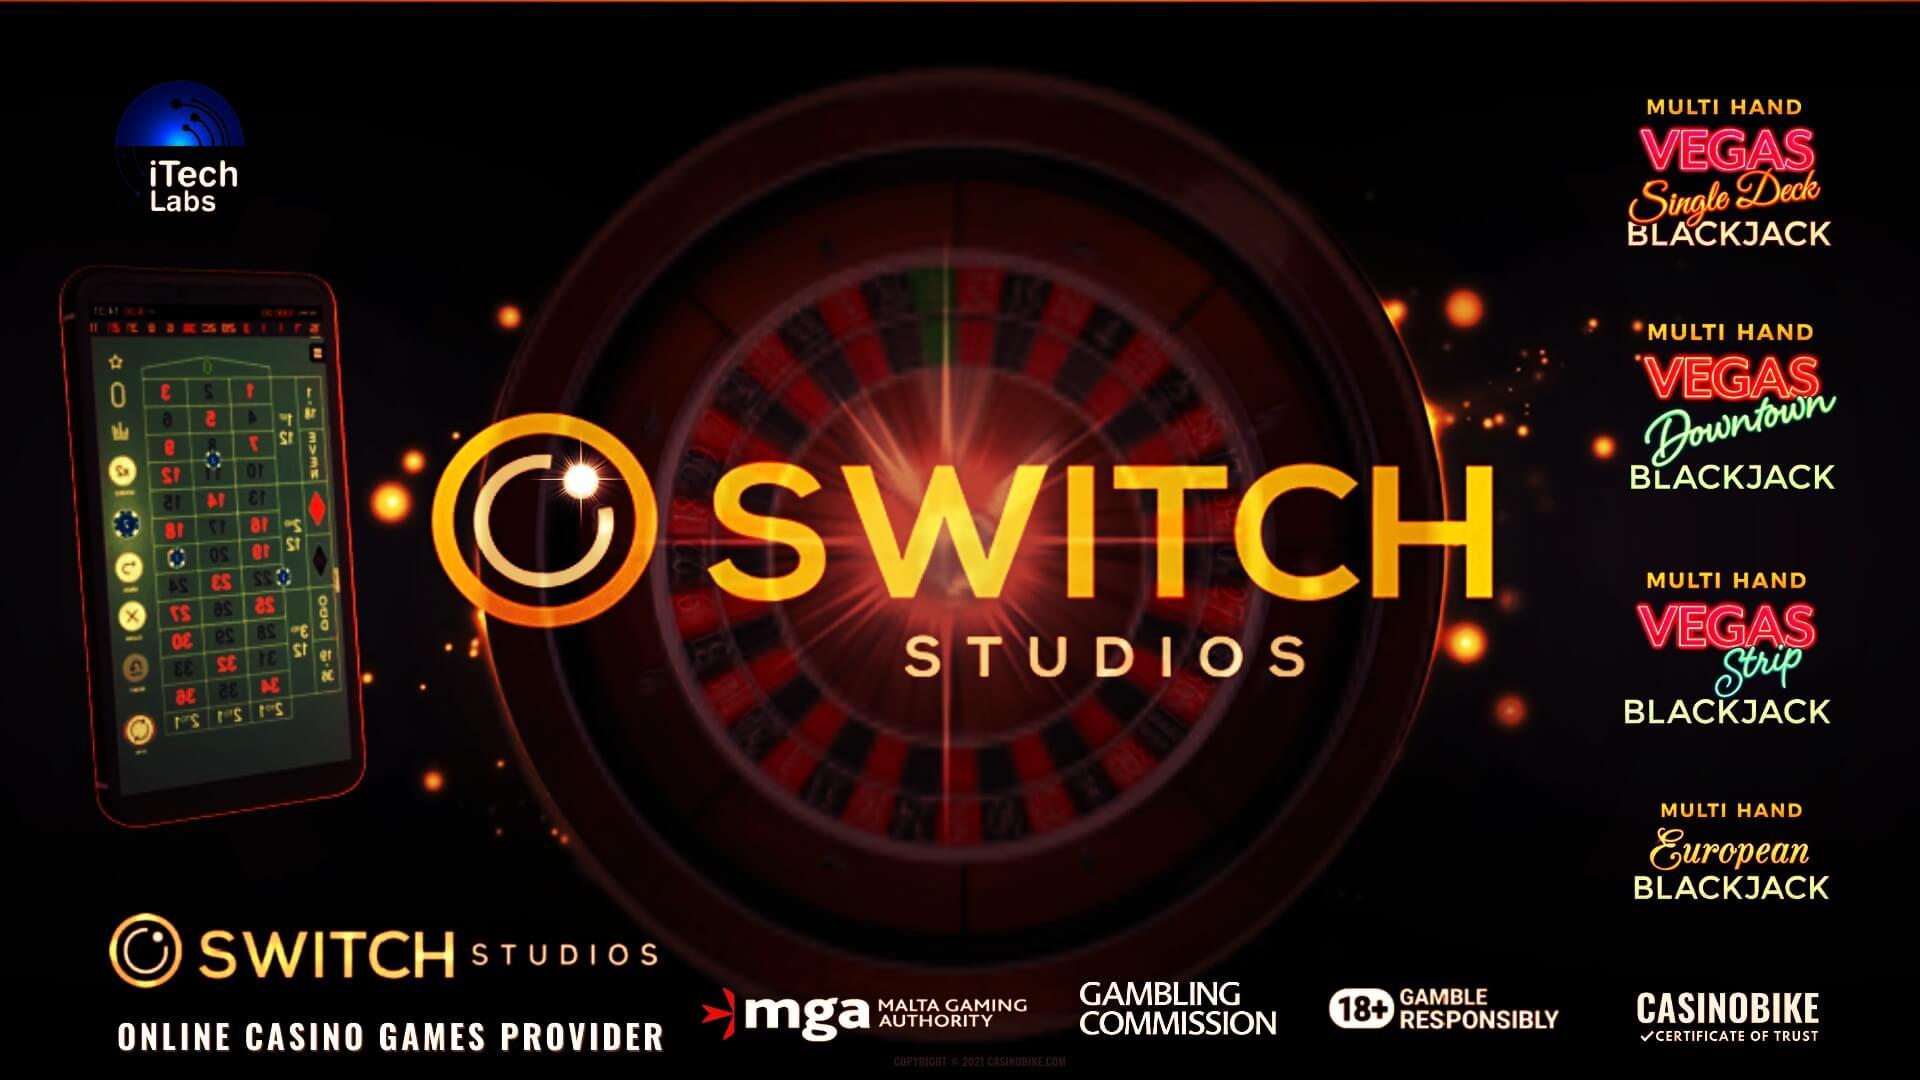 Switch Studios Online Casino Games Provider